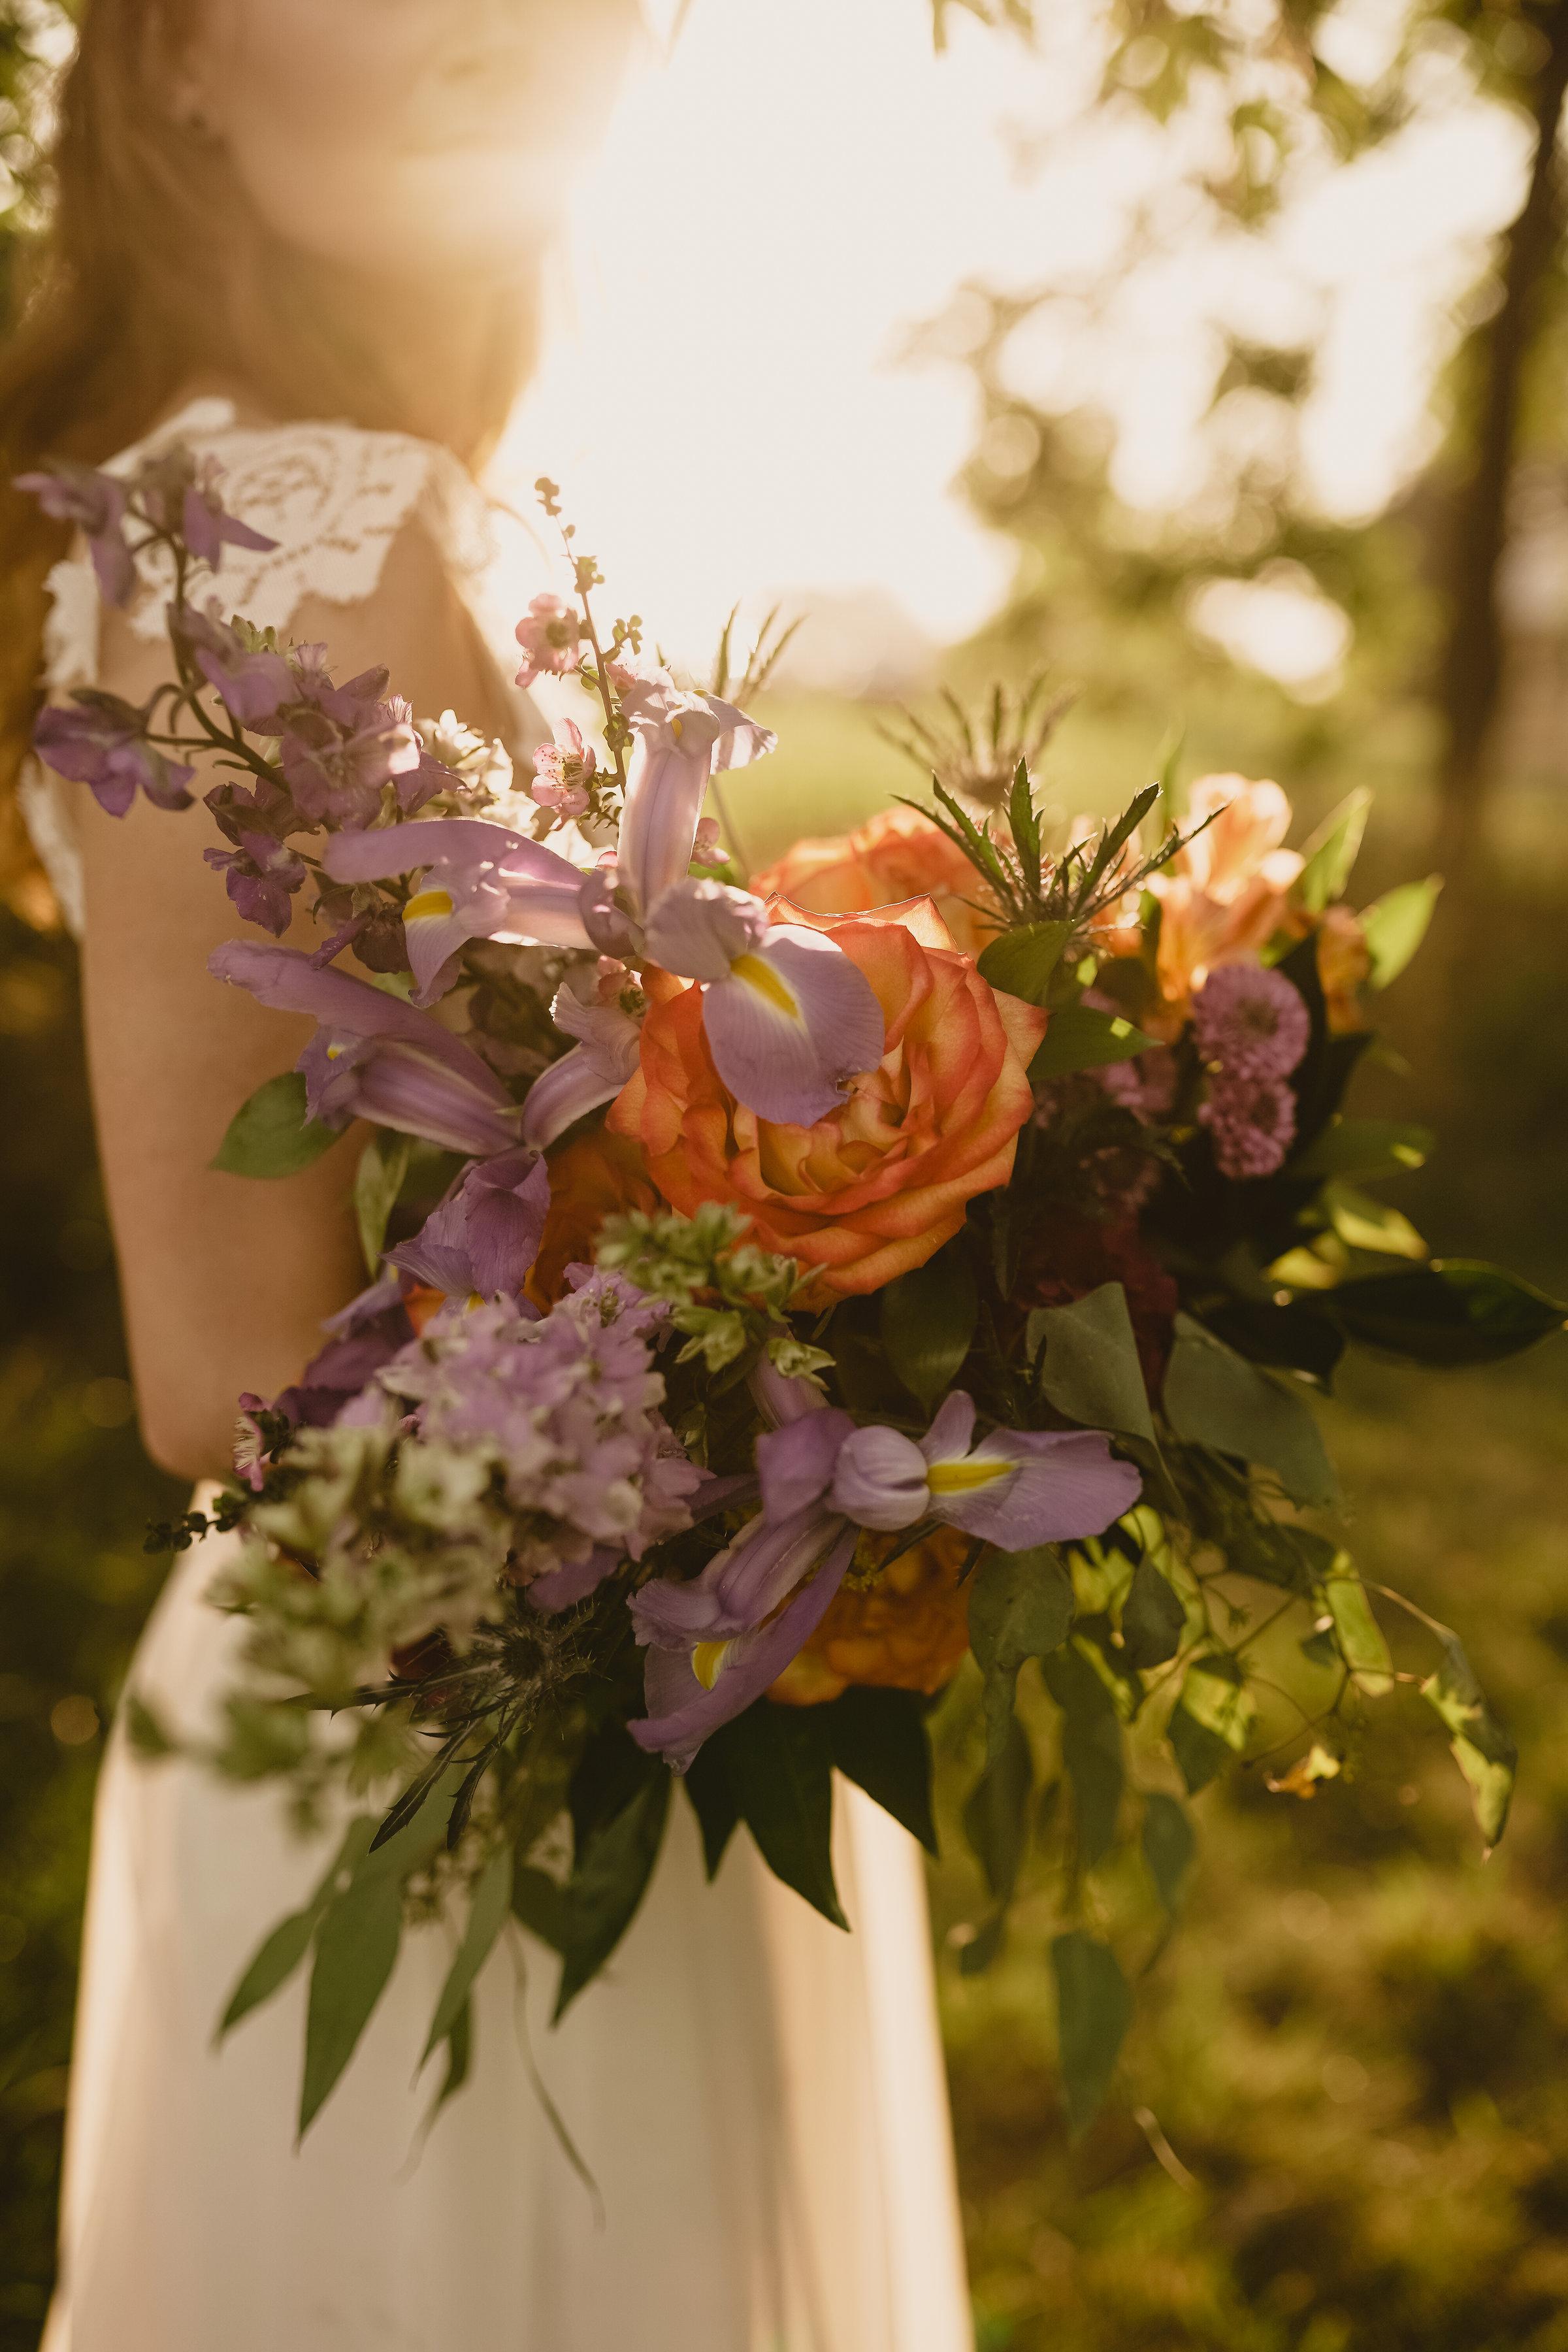 myrtle-mae-iris-aisle-dame-maiden-lavender-blue-floral-raelyn-ramey-photography-98.jpg